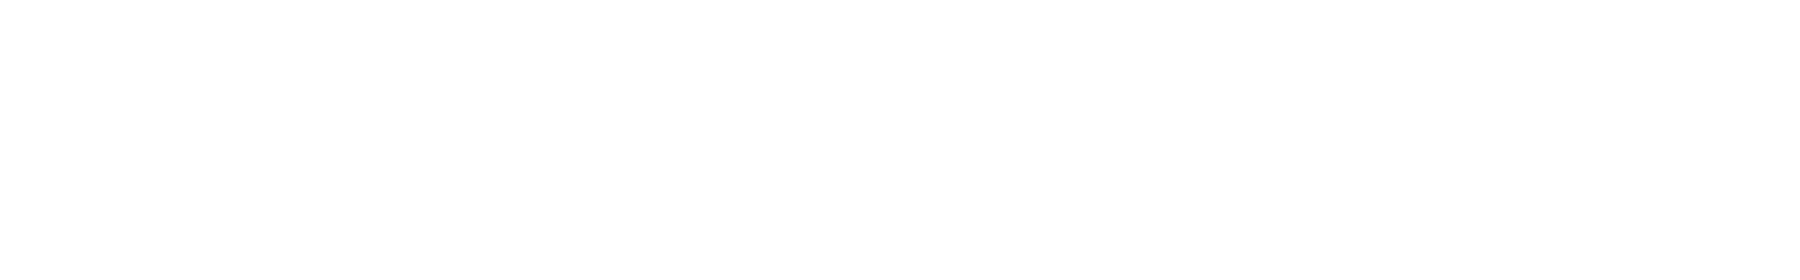 alvinspk51